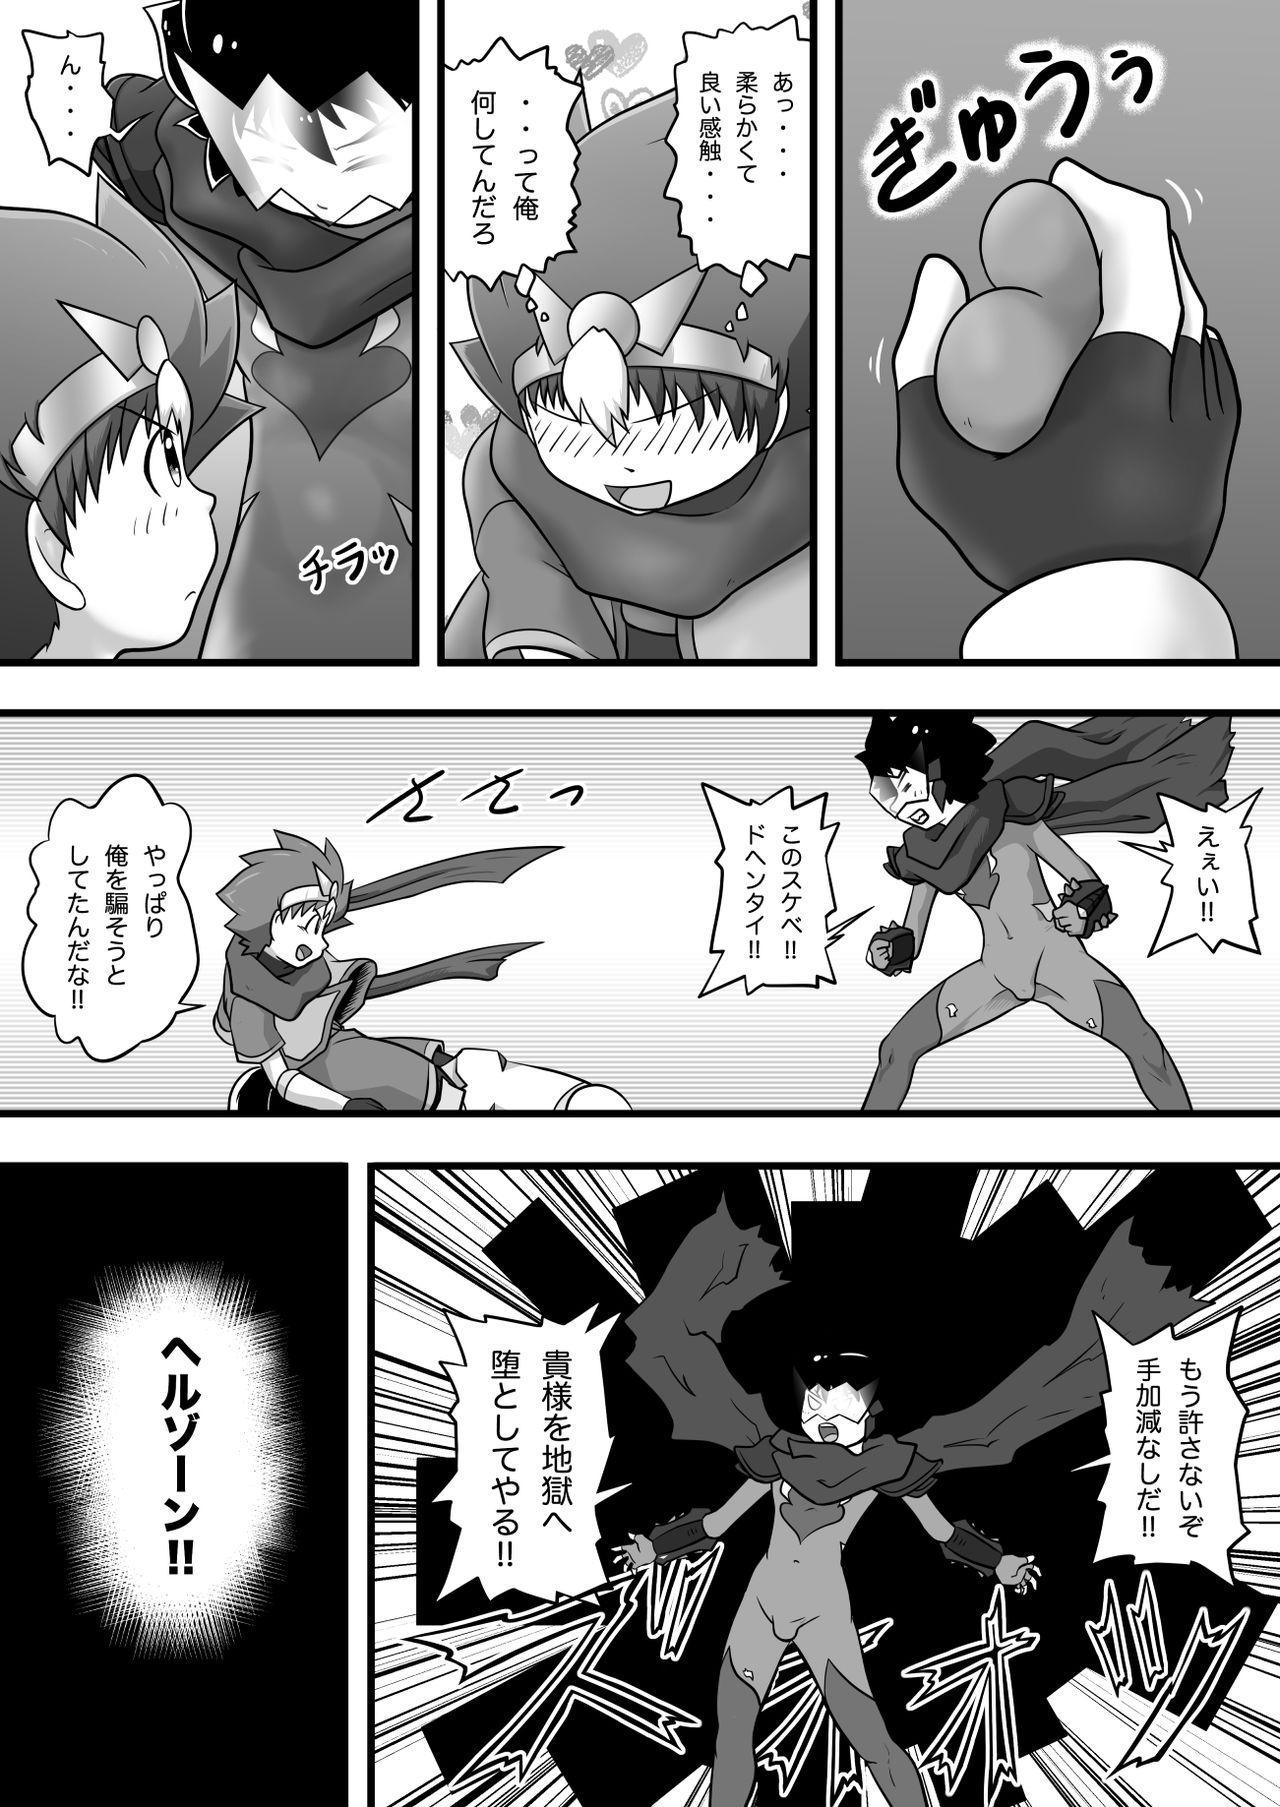 Chrono Kid TSURUGI VS Enboy 14